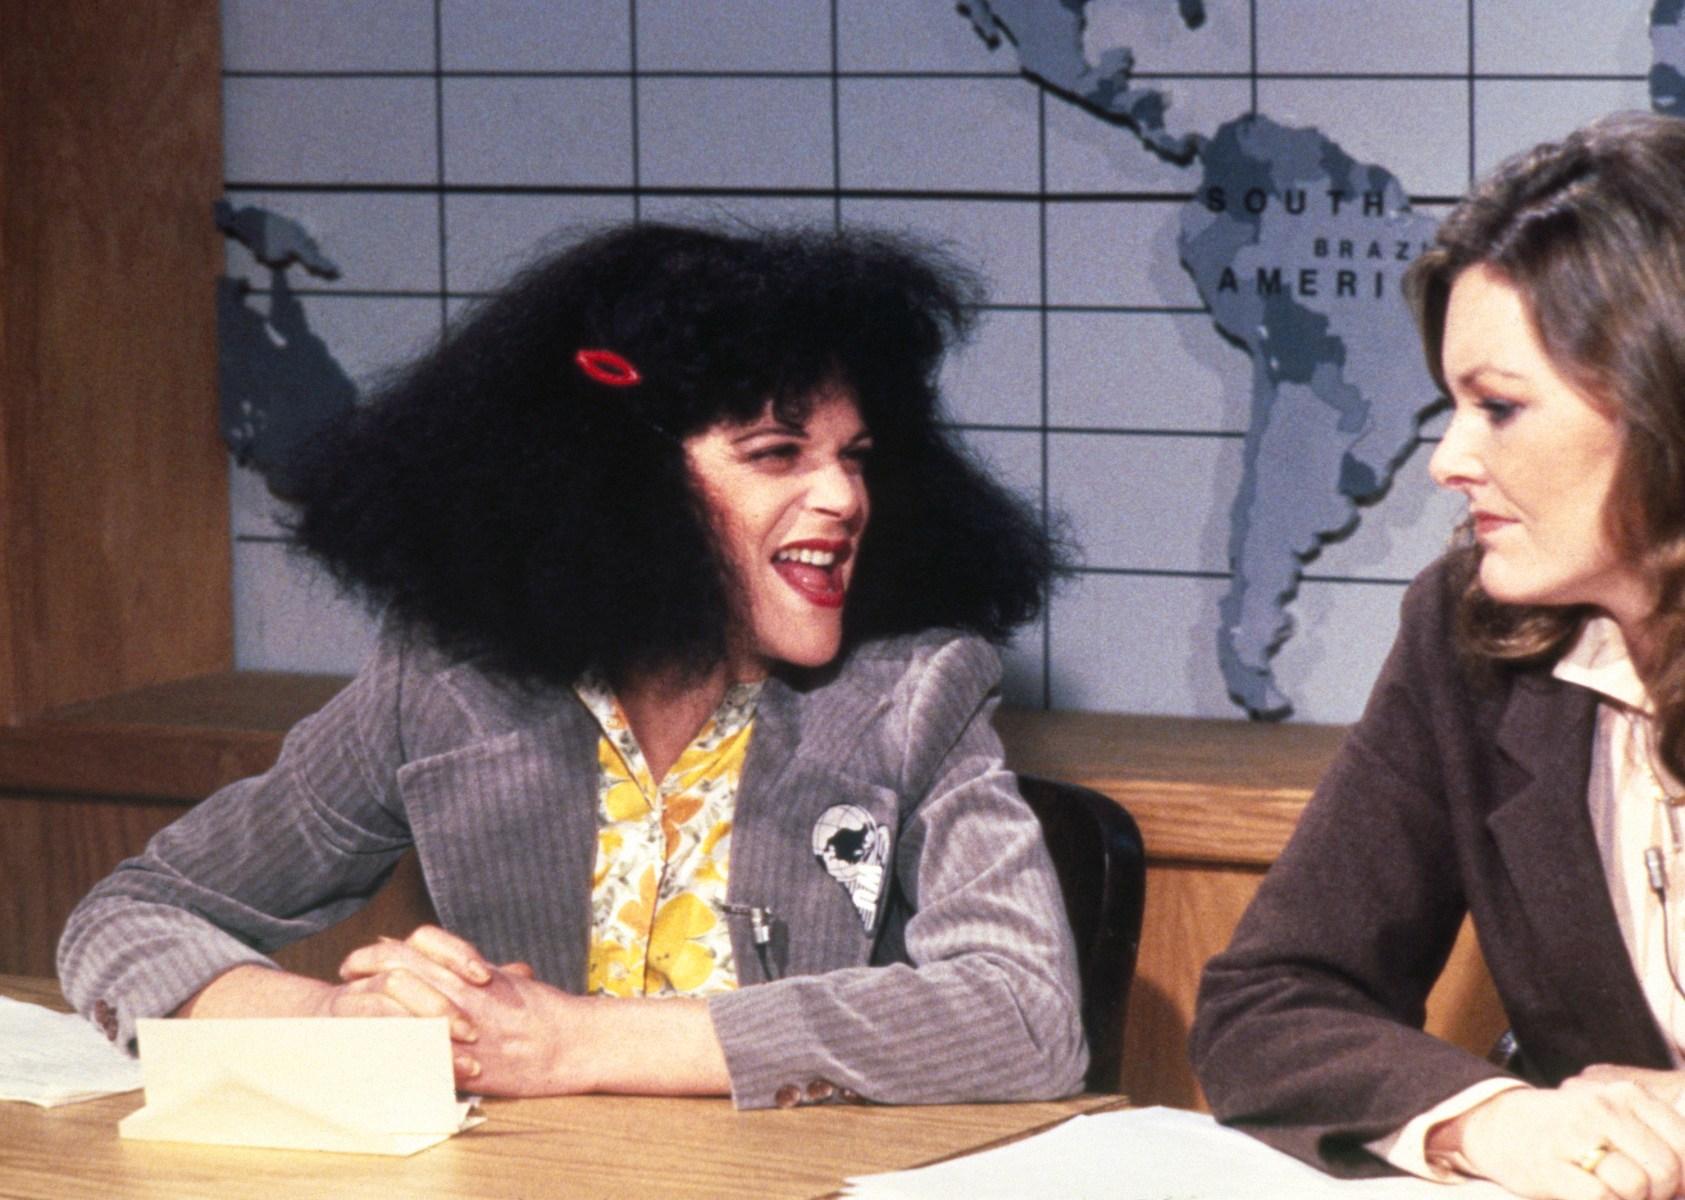 Gilda Radner as Roseanne Roseannadanna, Jane Curtin as herself  (NBC/NBCU Photo Bank via Getty Images)